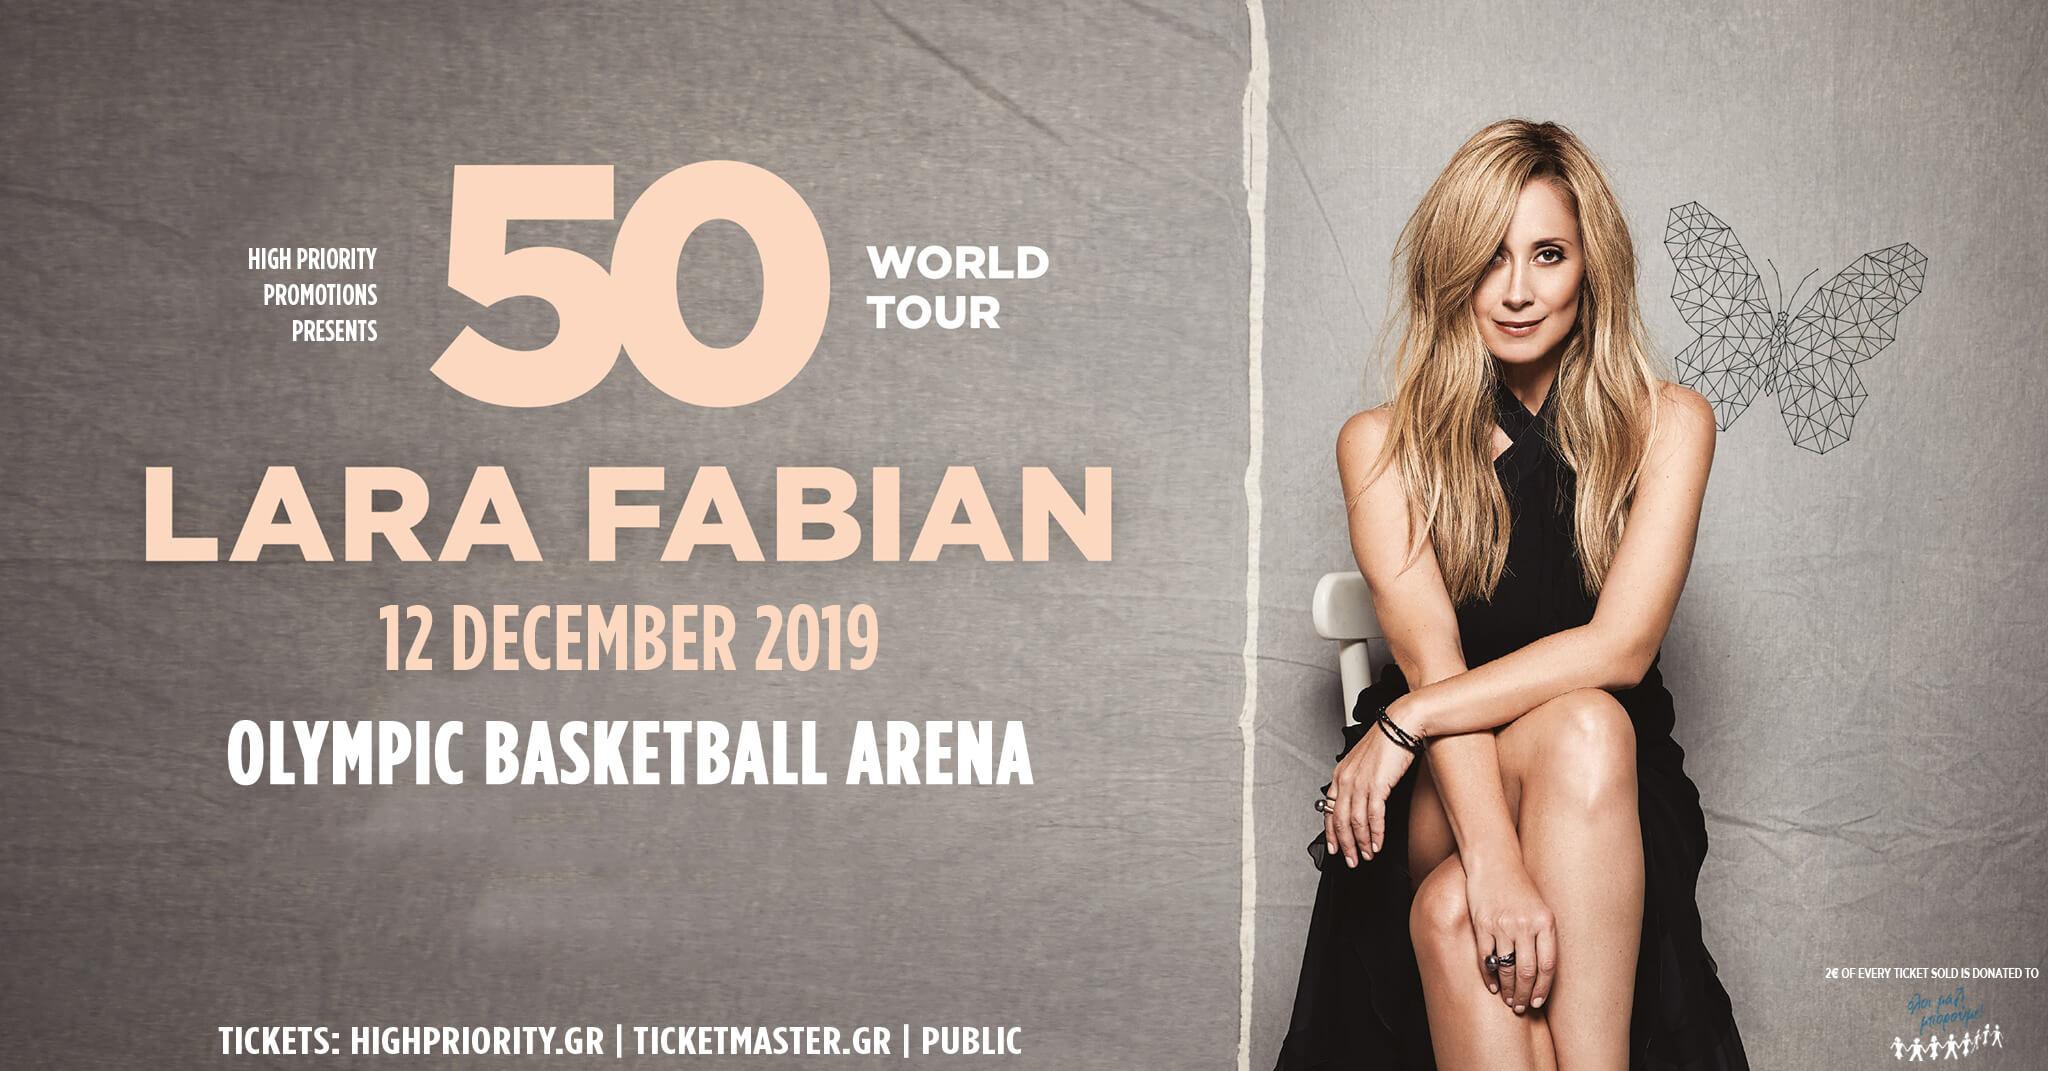 LARA FABIAN live @ Κλειστό Γήπεδο Μπάσκετ ΟΑΚΑ, Αθήνα – Μαρούσι, στις 12 Δεκεμβρίου